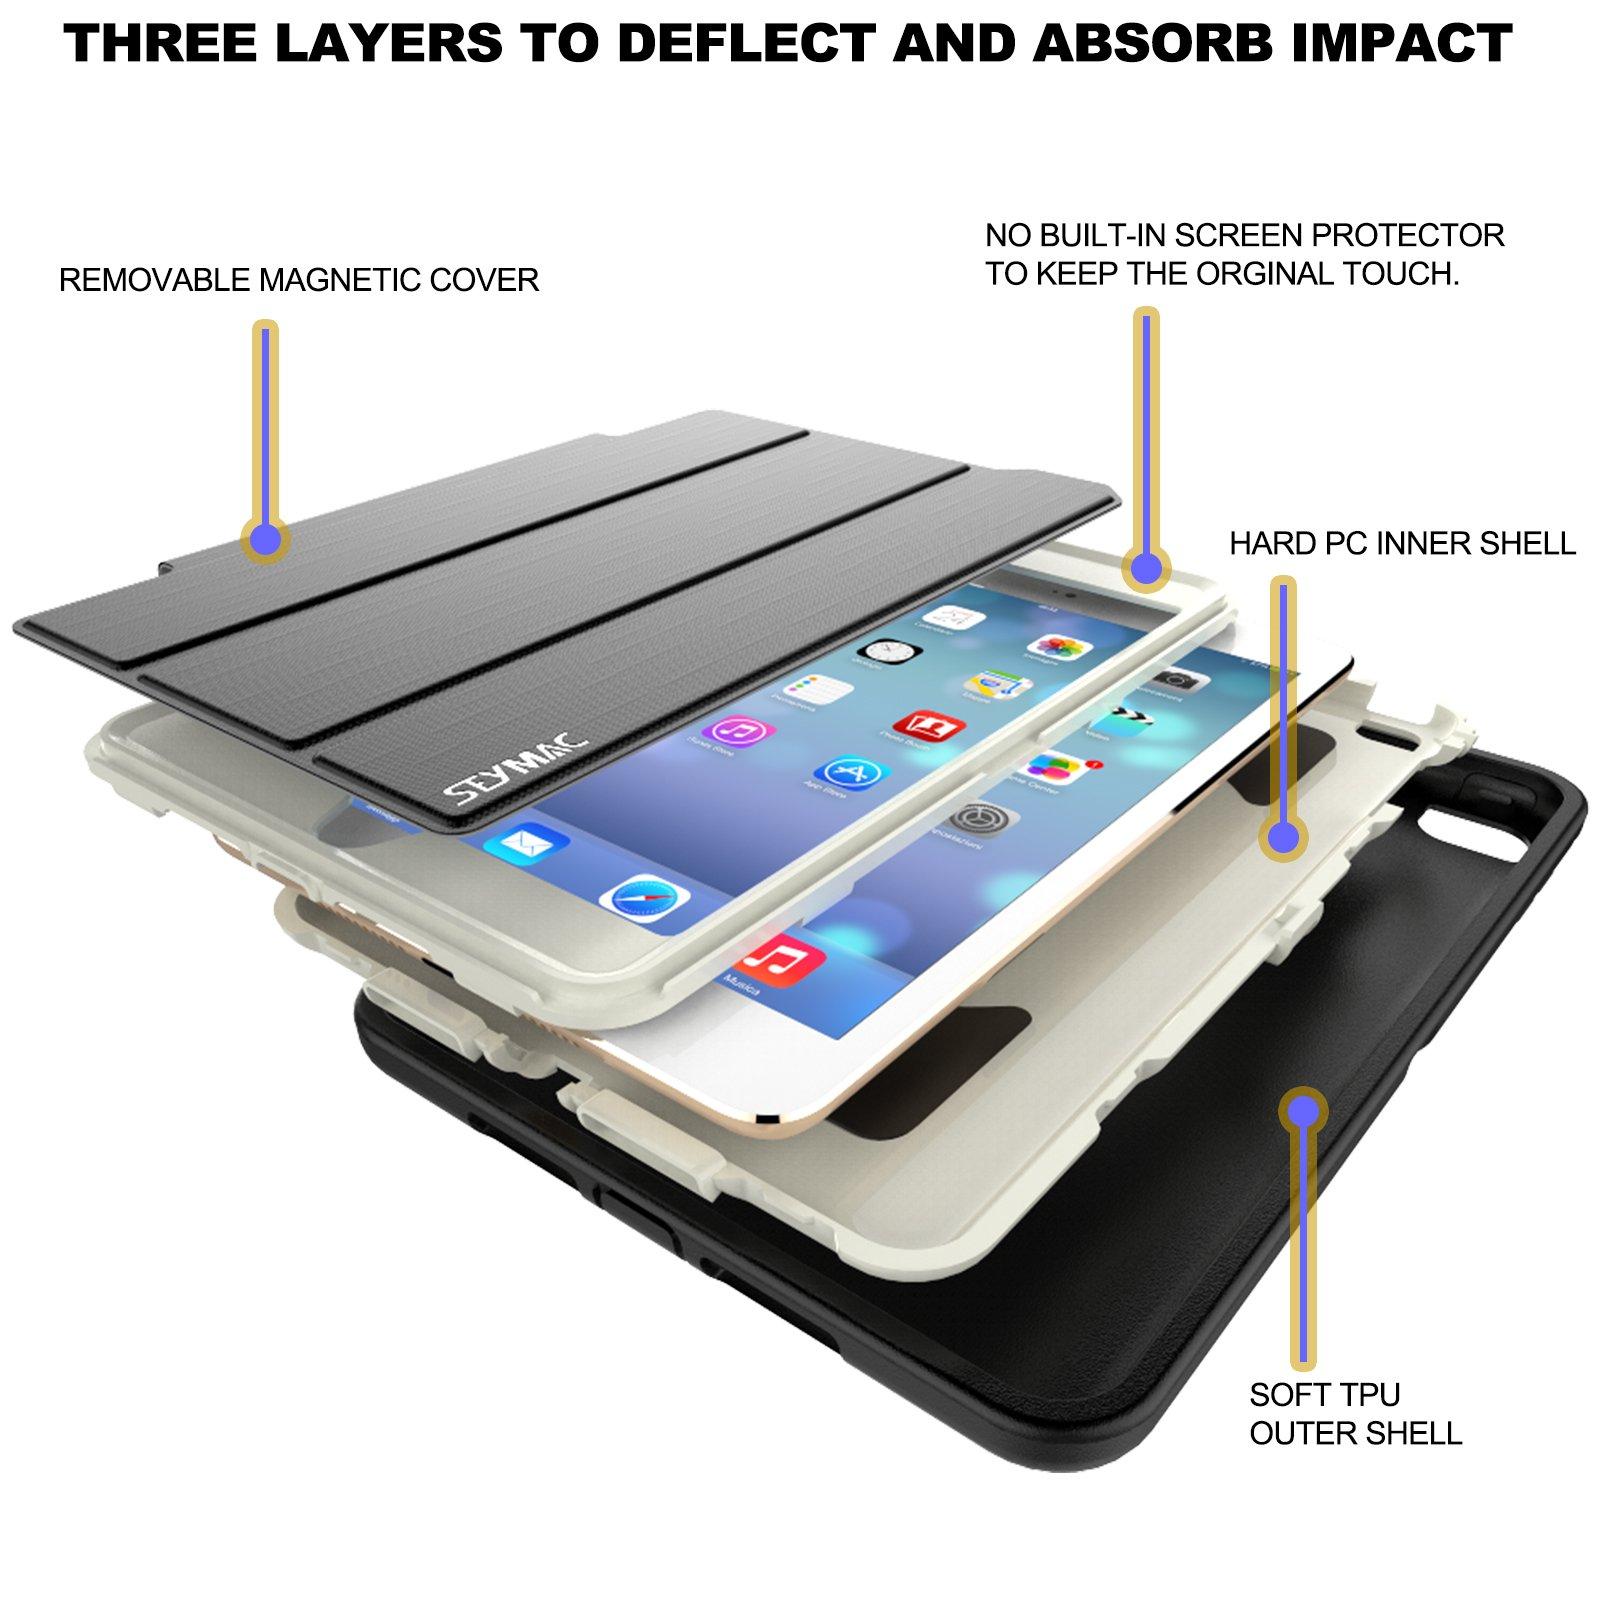 SEYMAC Compatible with iPad Mini 1/2/3 Case, Three Layer Drop Protection Rugged Protective Heavy Duty Case Magnetic Smart Auto Wake/Sleep Cover for iPad Mini 1/2/3(Black/Cream)